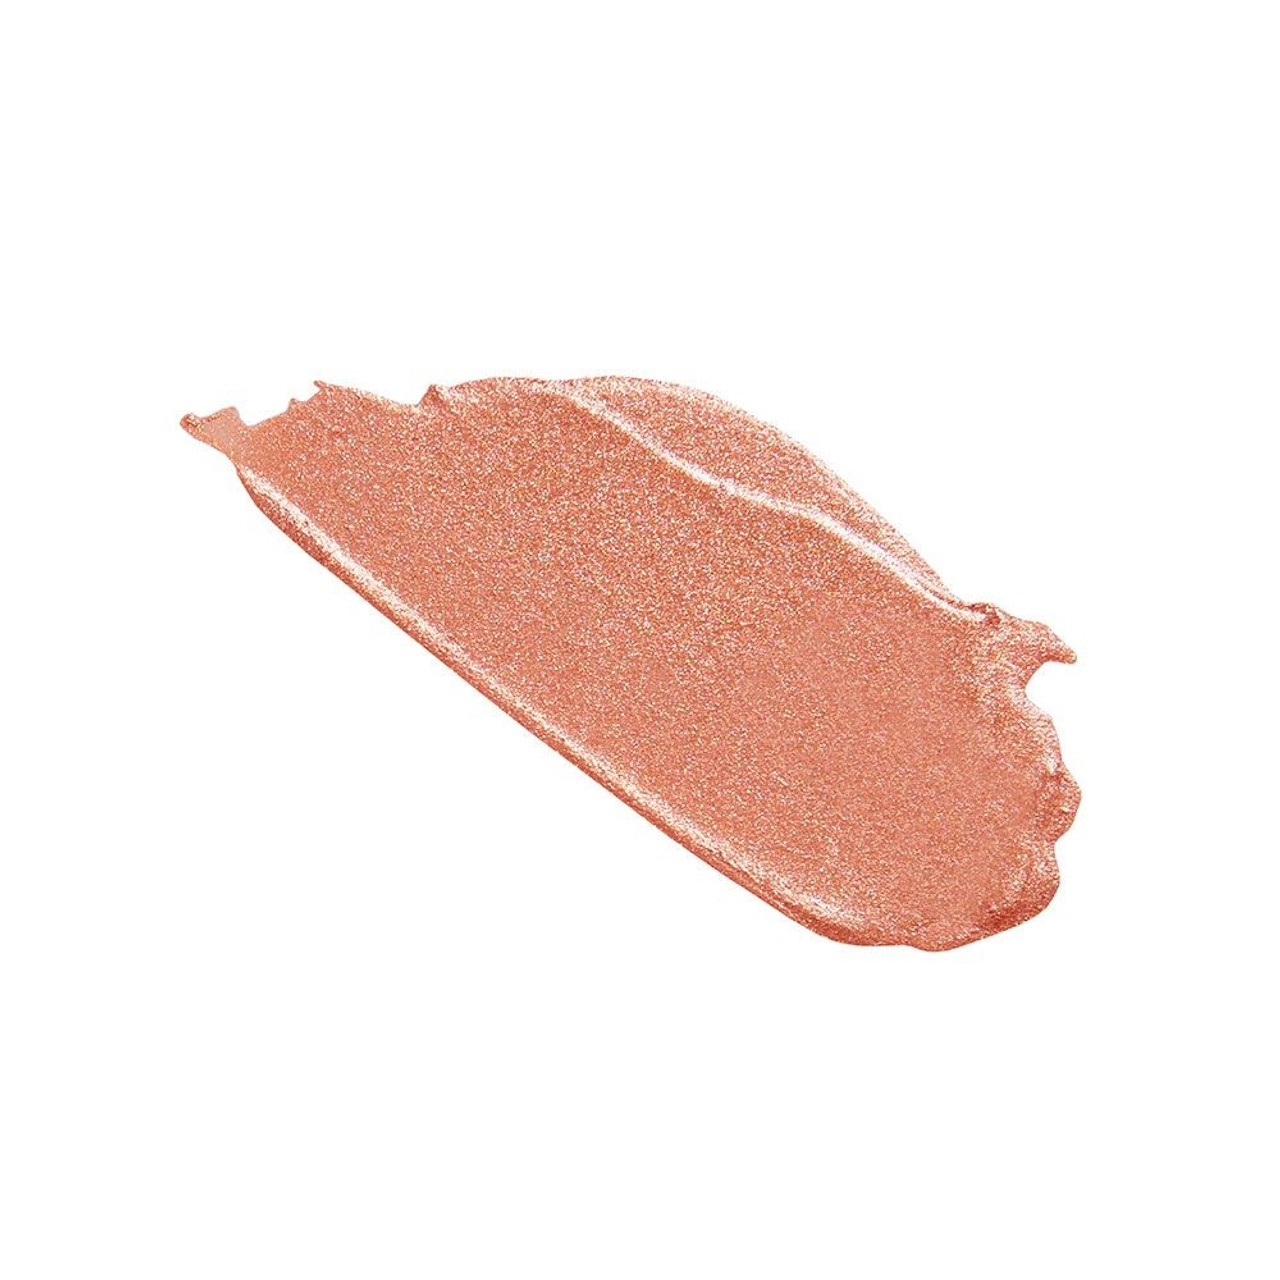 Grande Cosmetics GrandeGLOW Plumping Liquid Highlighter - Bronze Beam